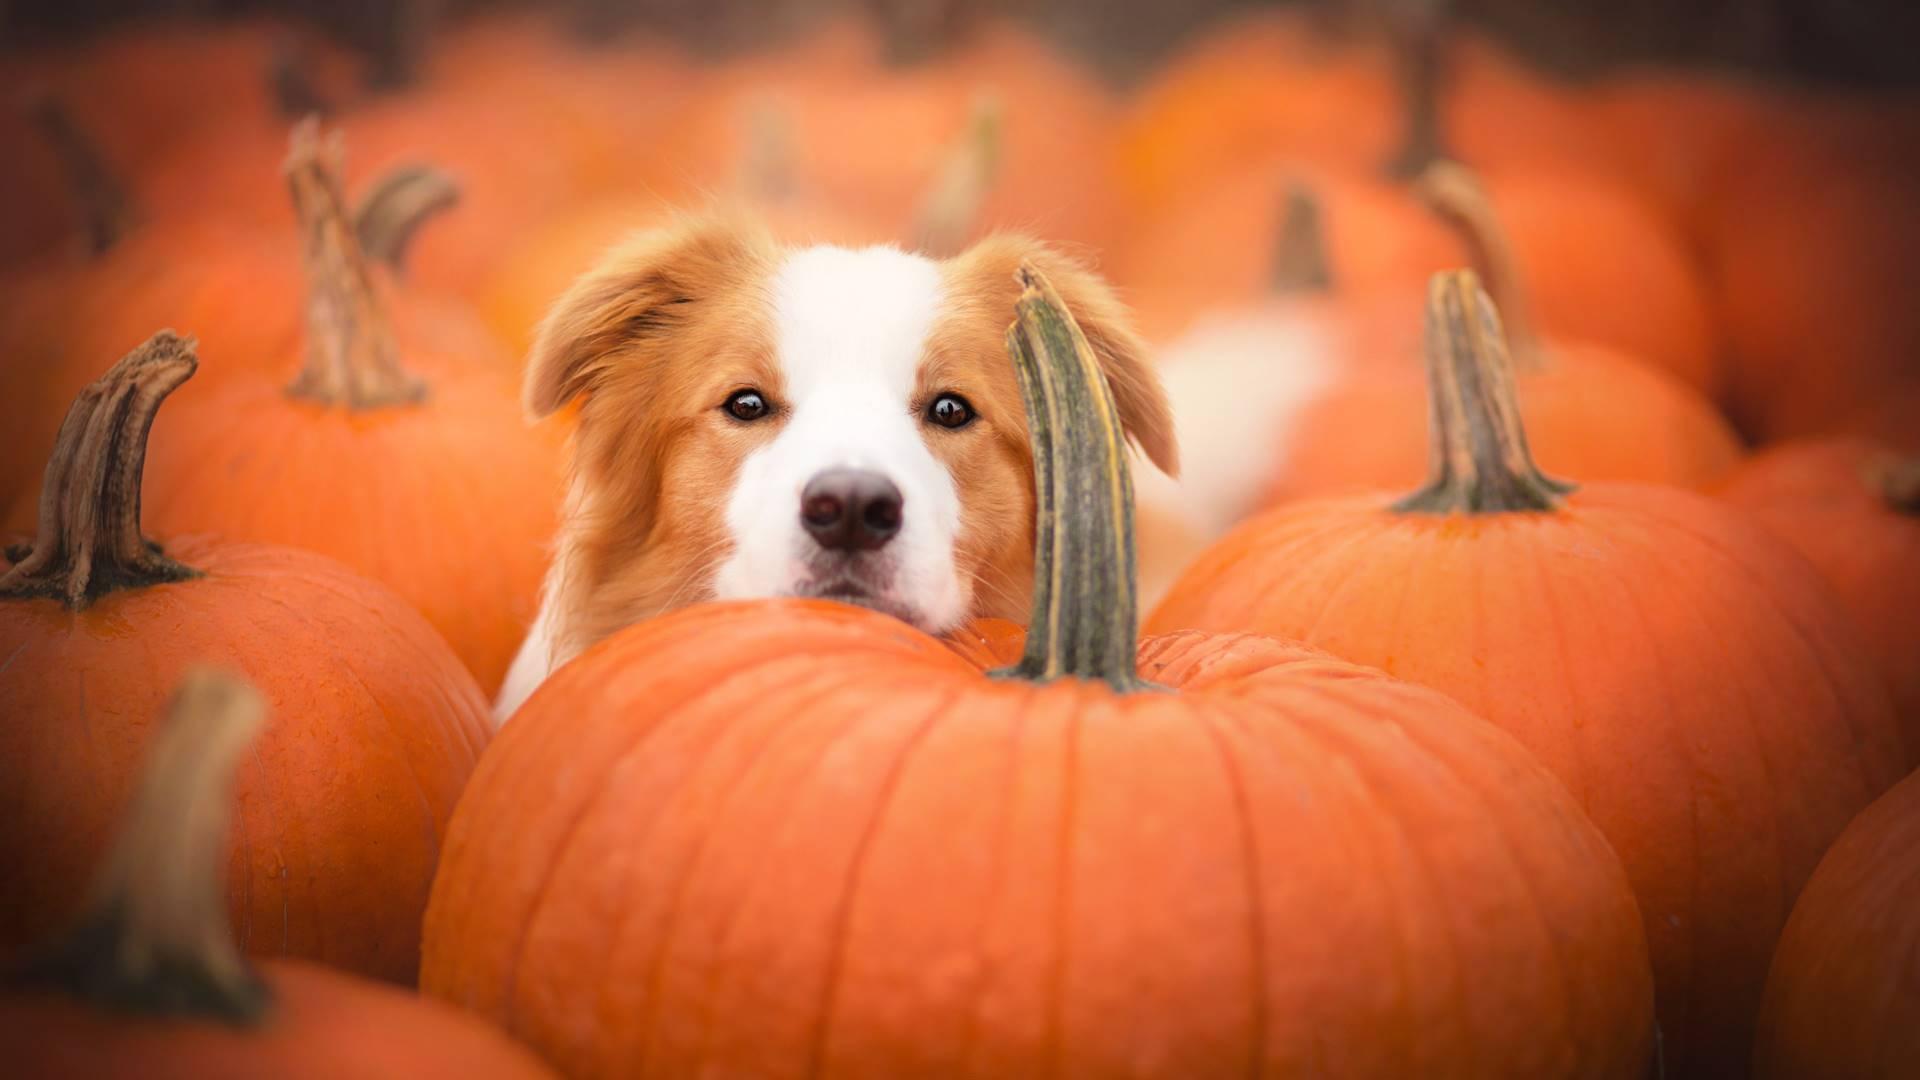 puppy in a pumpkin patch